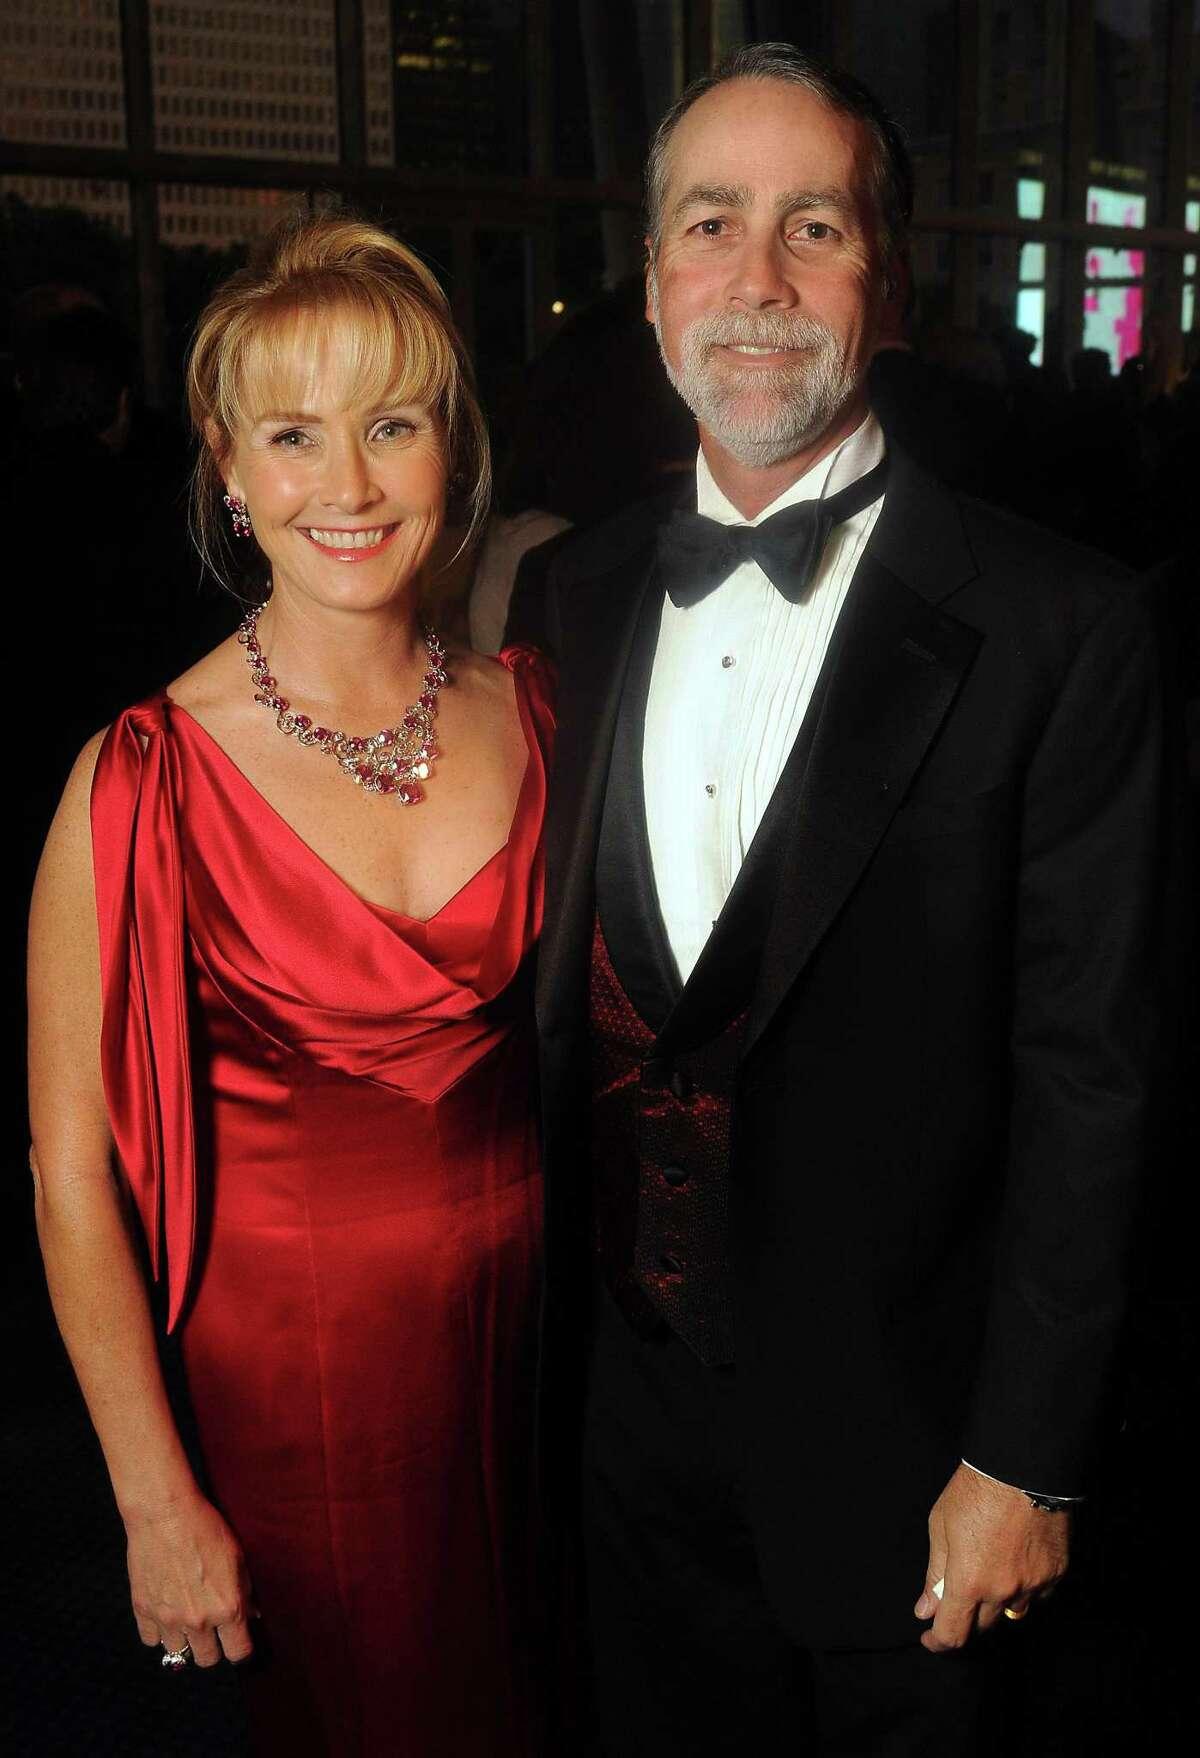 Randa Williams and her husband Charlie at the TUTS gala at the Hobby Center Friday April 20,2012. (Dave Rossman Photo)